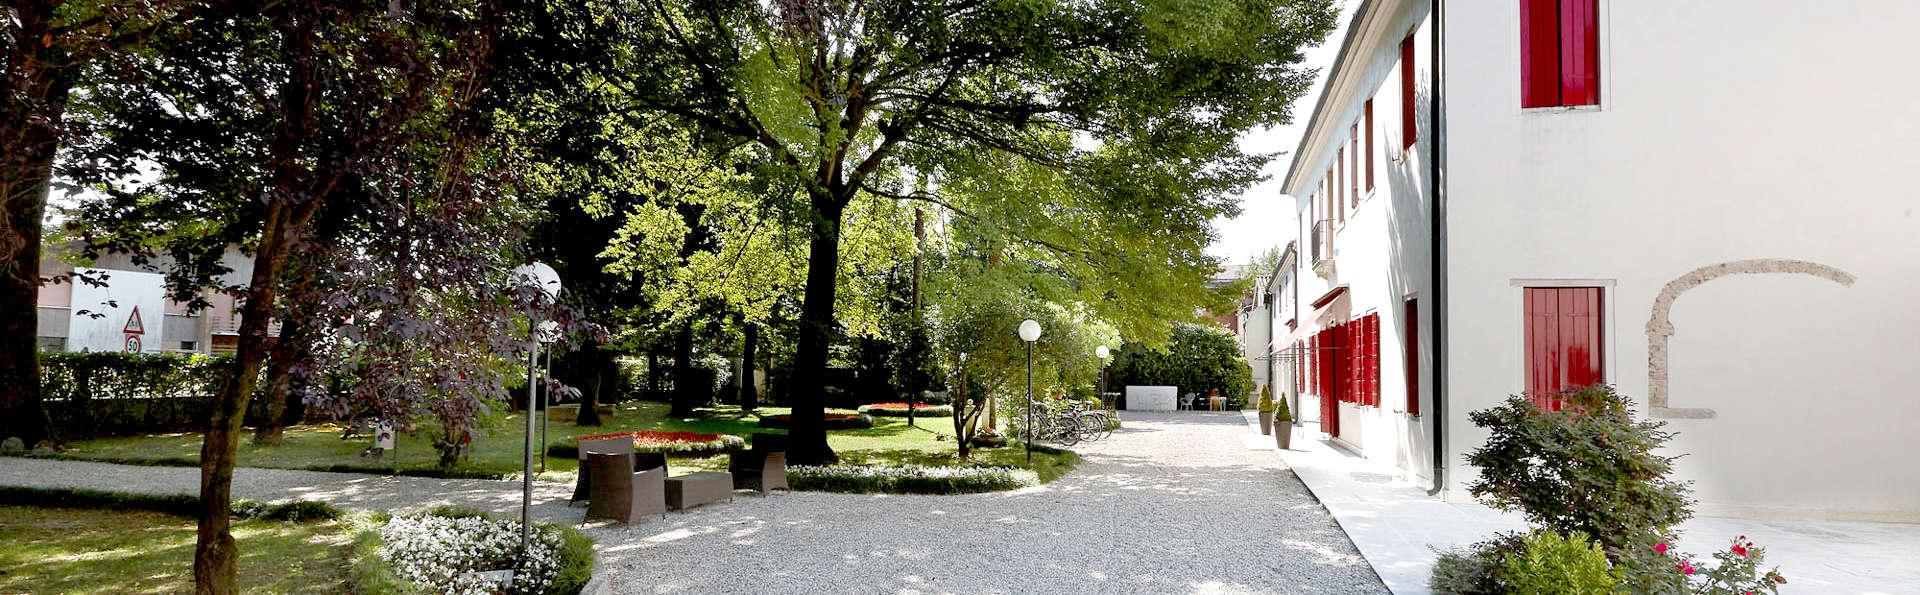 Villa Patriarca Hotel - Edit_Garden.jpg